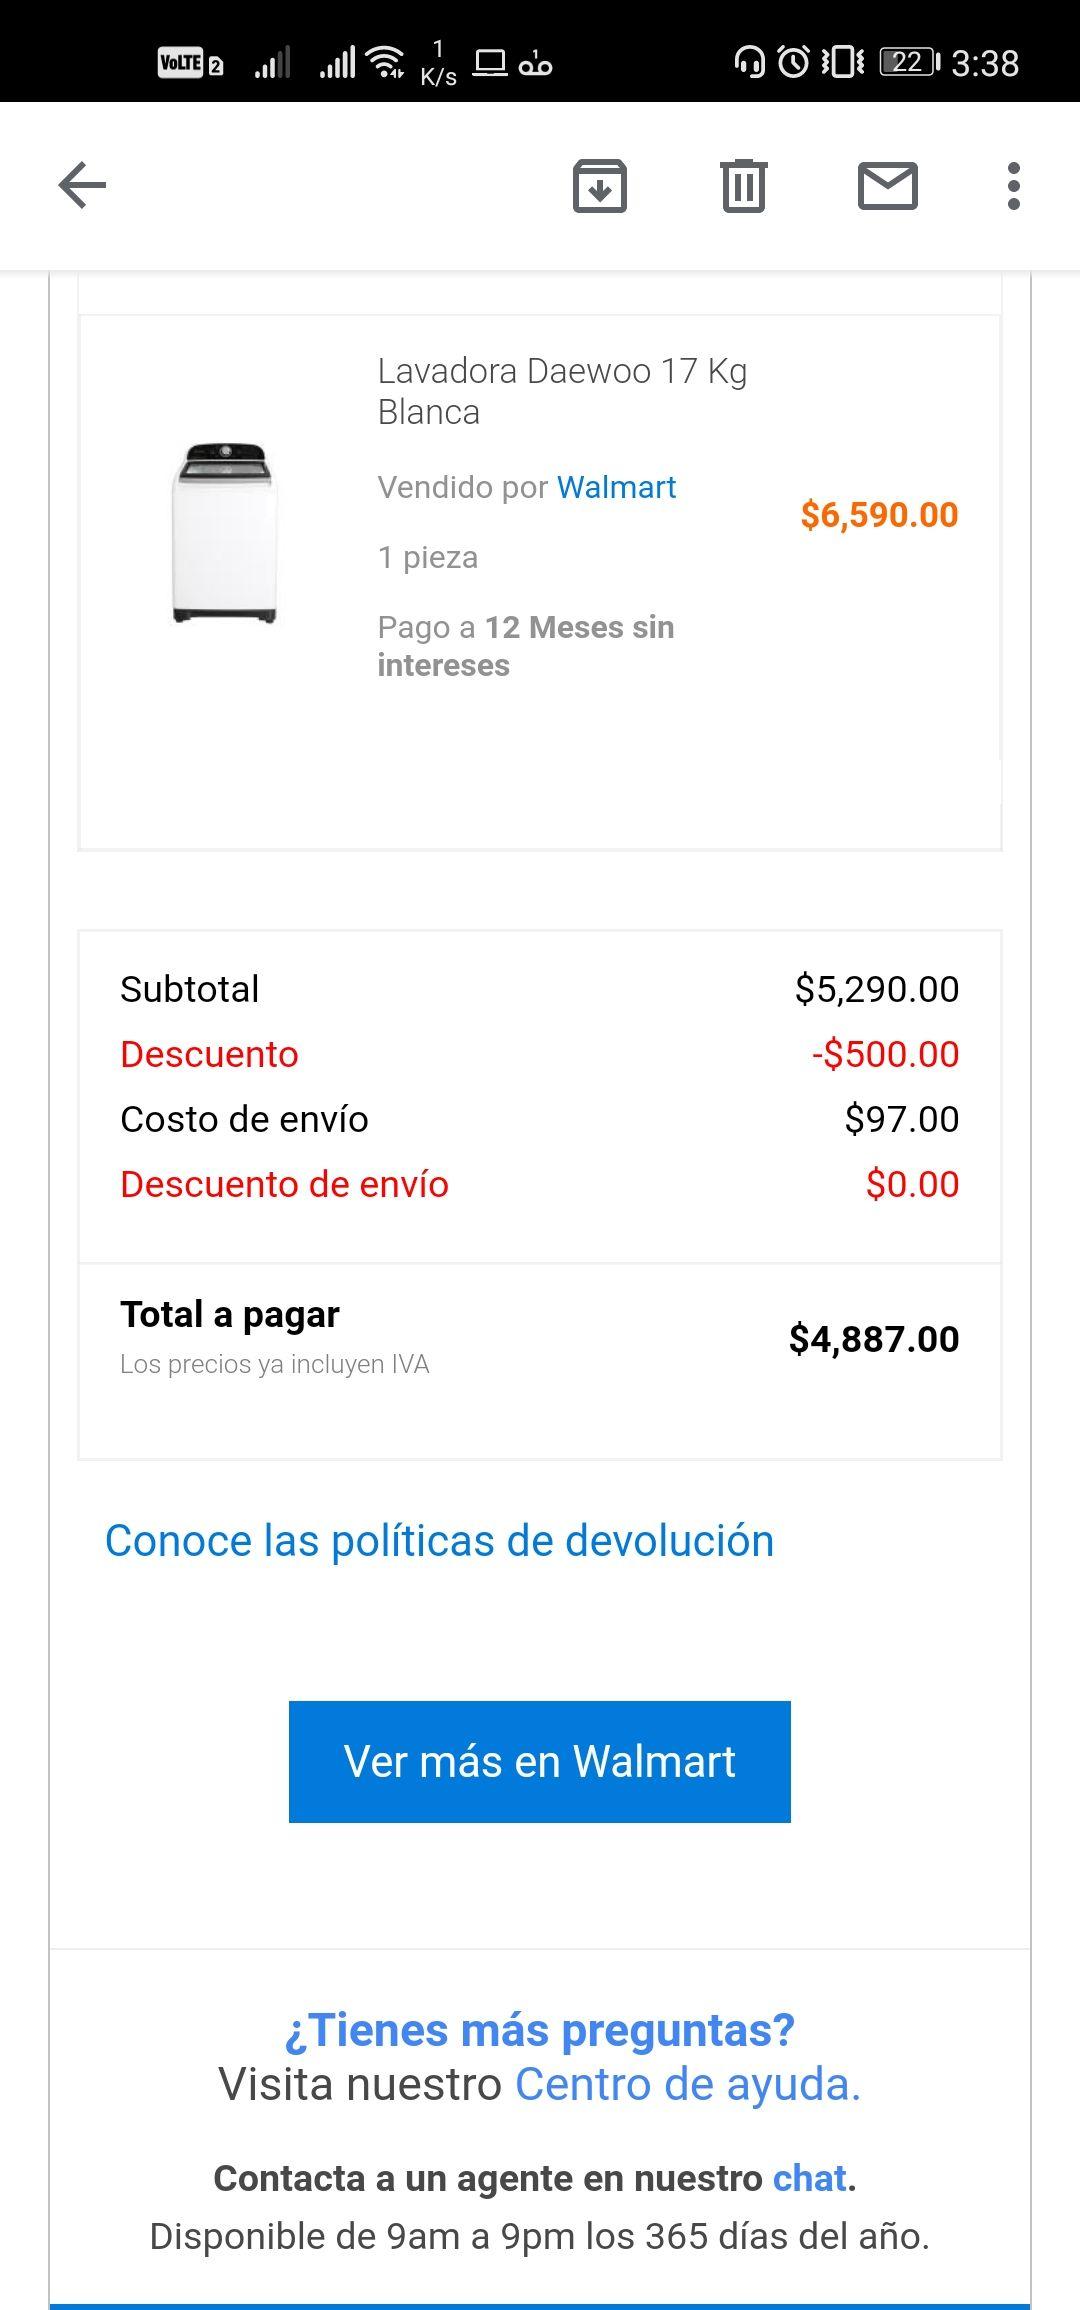 Walmart: Lavadora Daewoo 17Kg hasta 12 o 18 MSI con BBVA